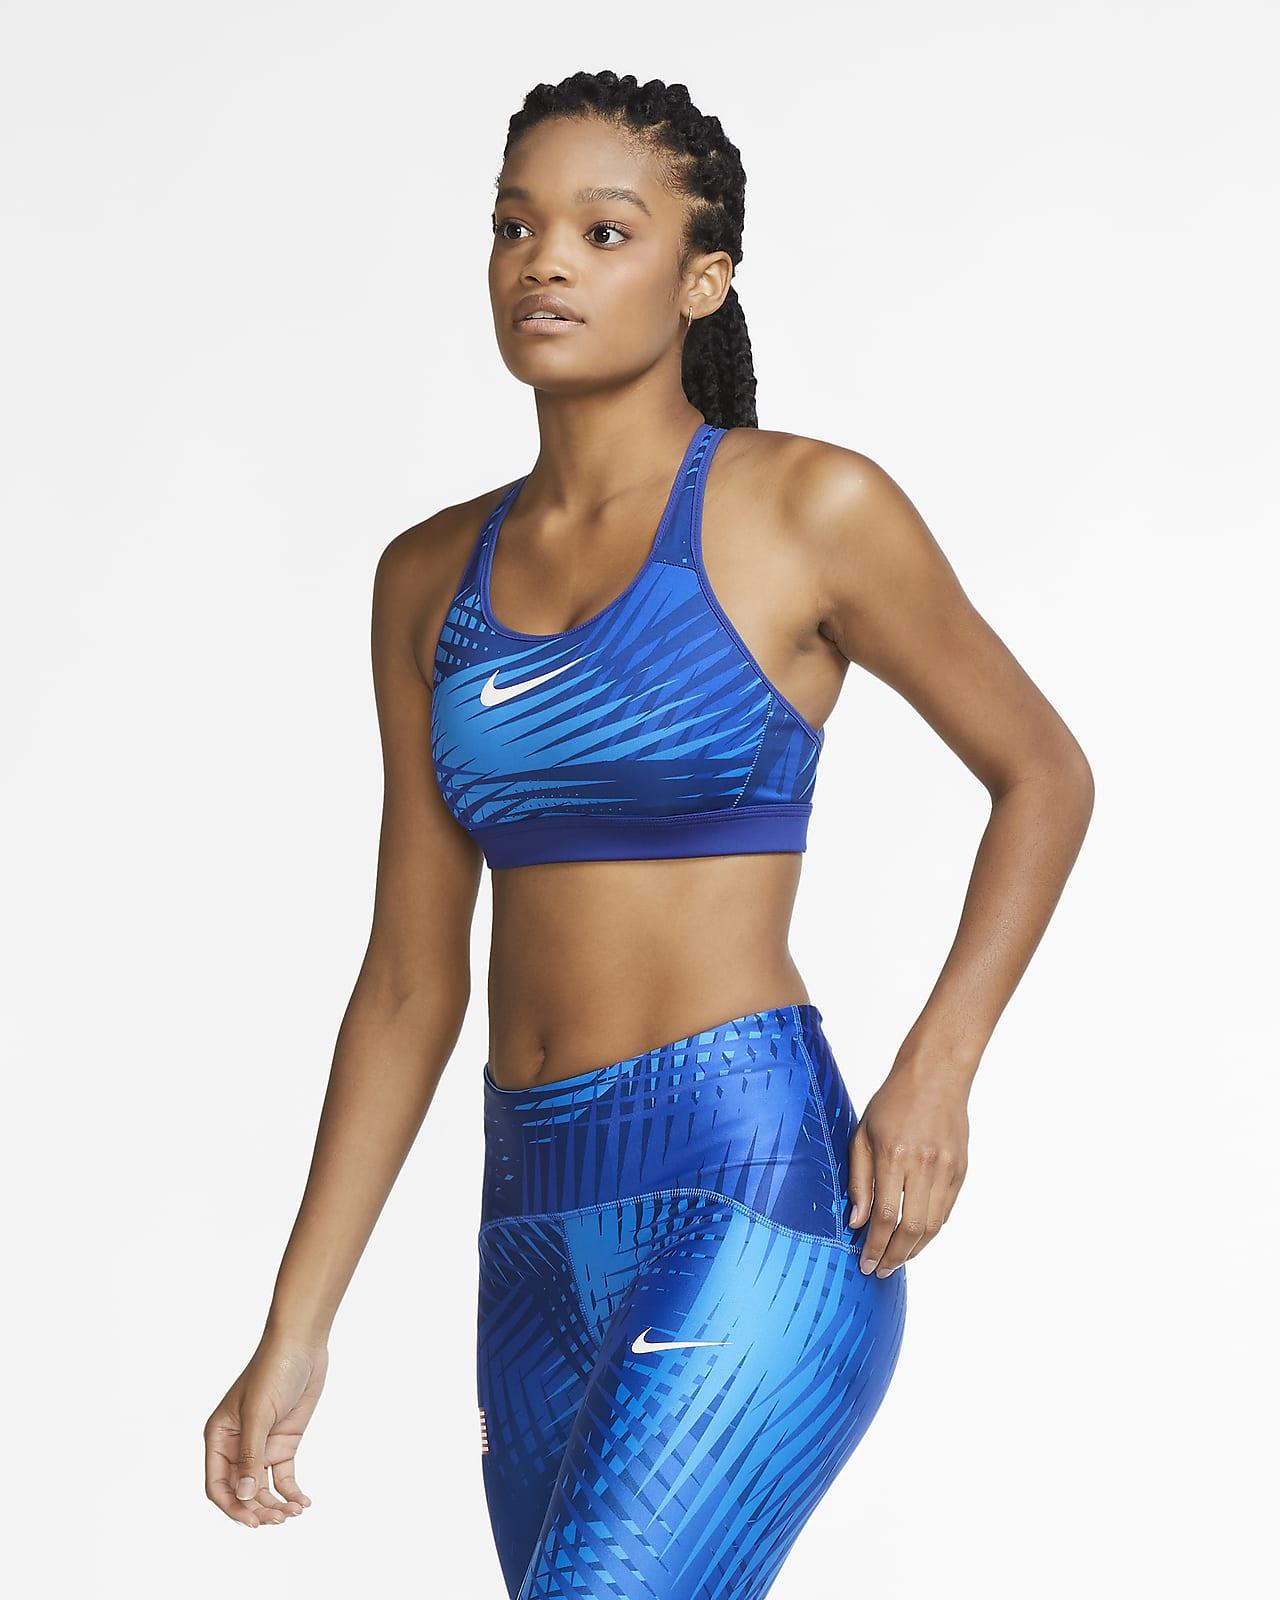 Bra deportivo con tirantes sin almohadilla de alta sujeción para mujer Nike Team USA Impact